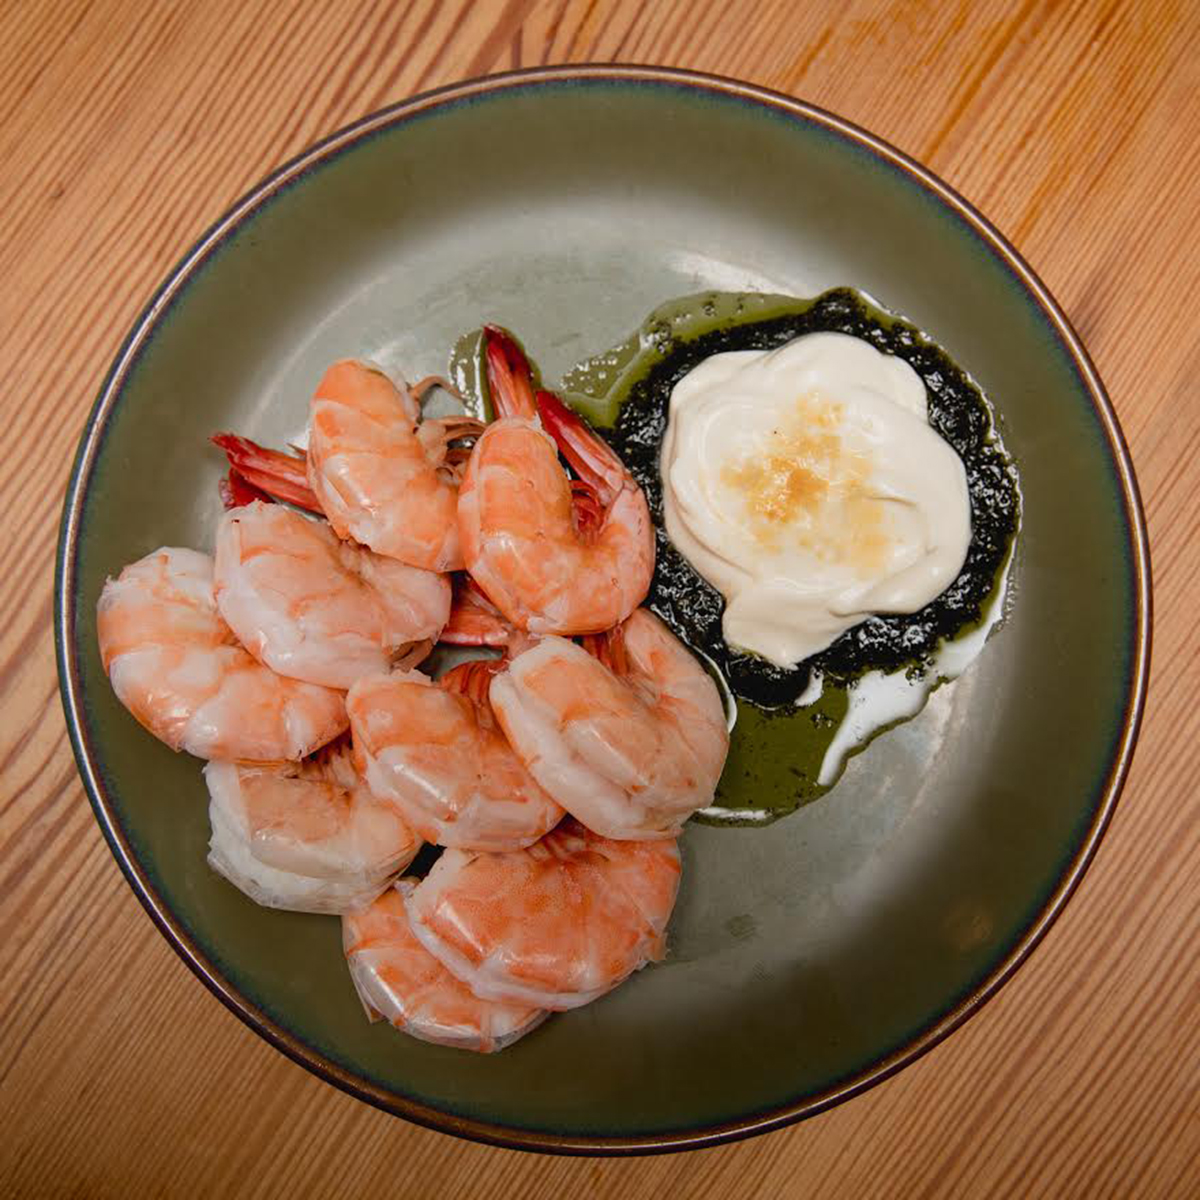 Northern shrimp at Café du Pays